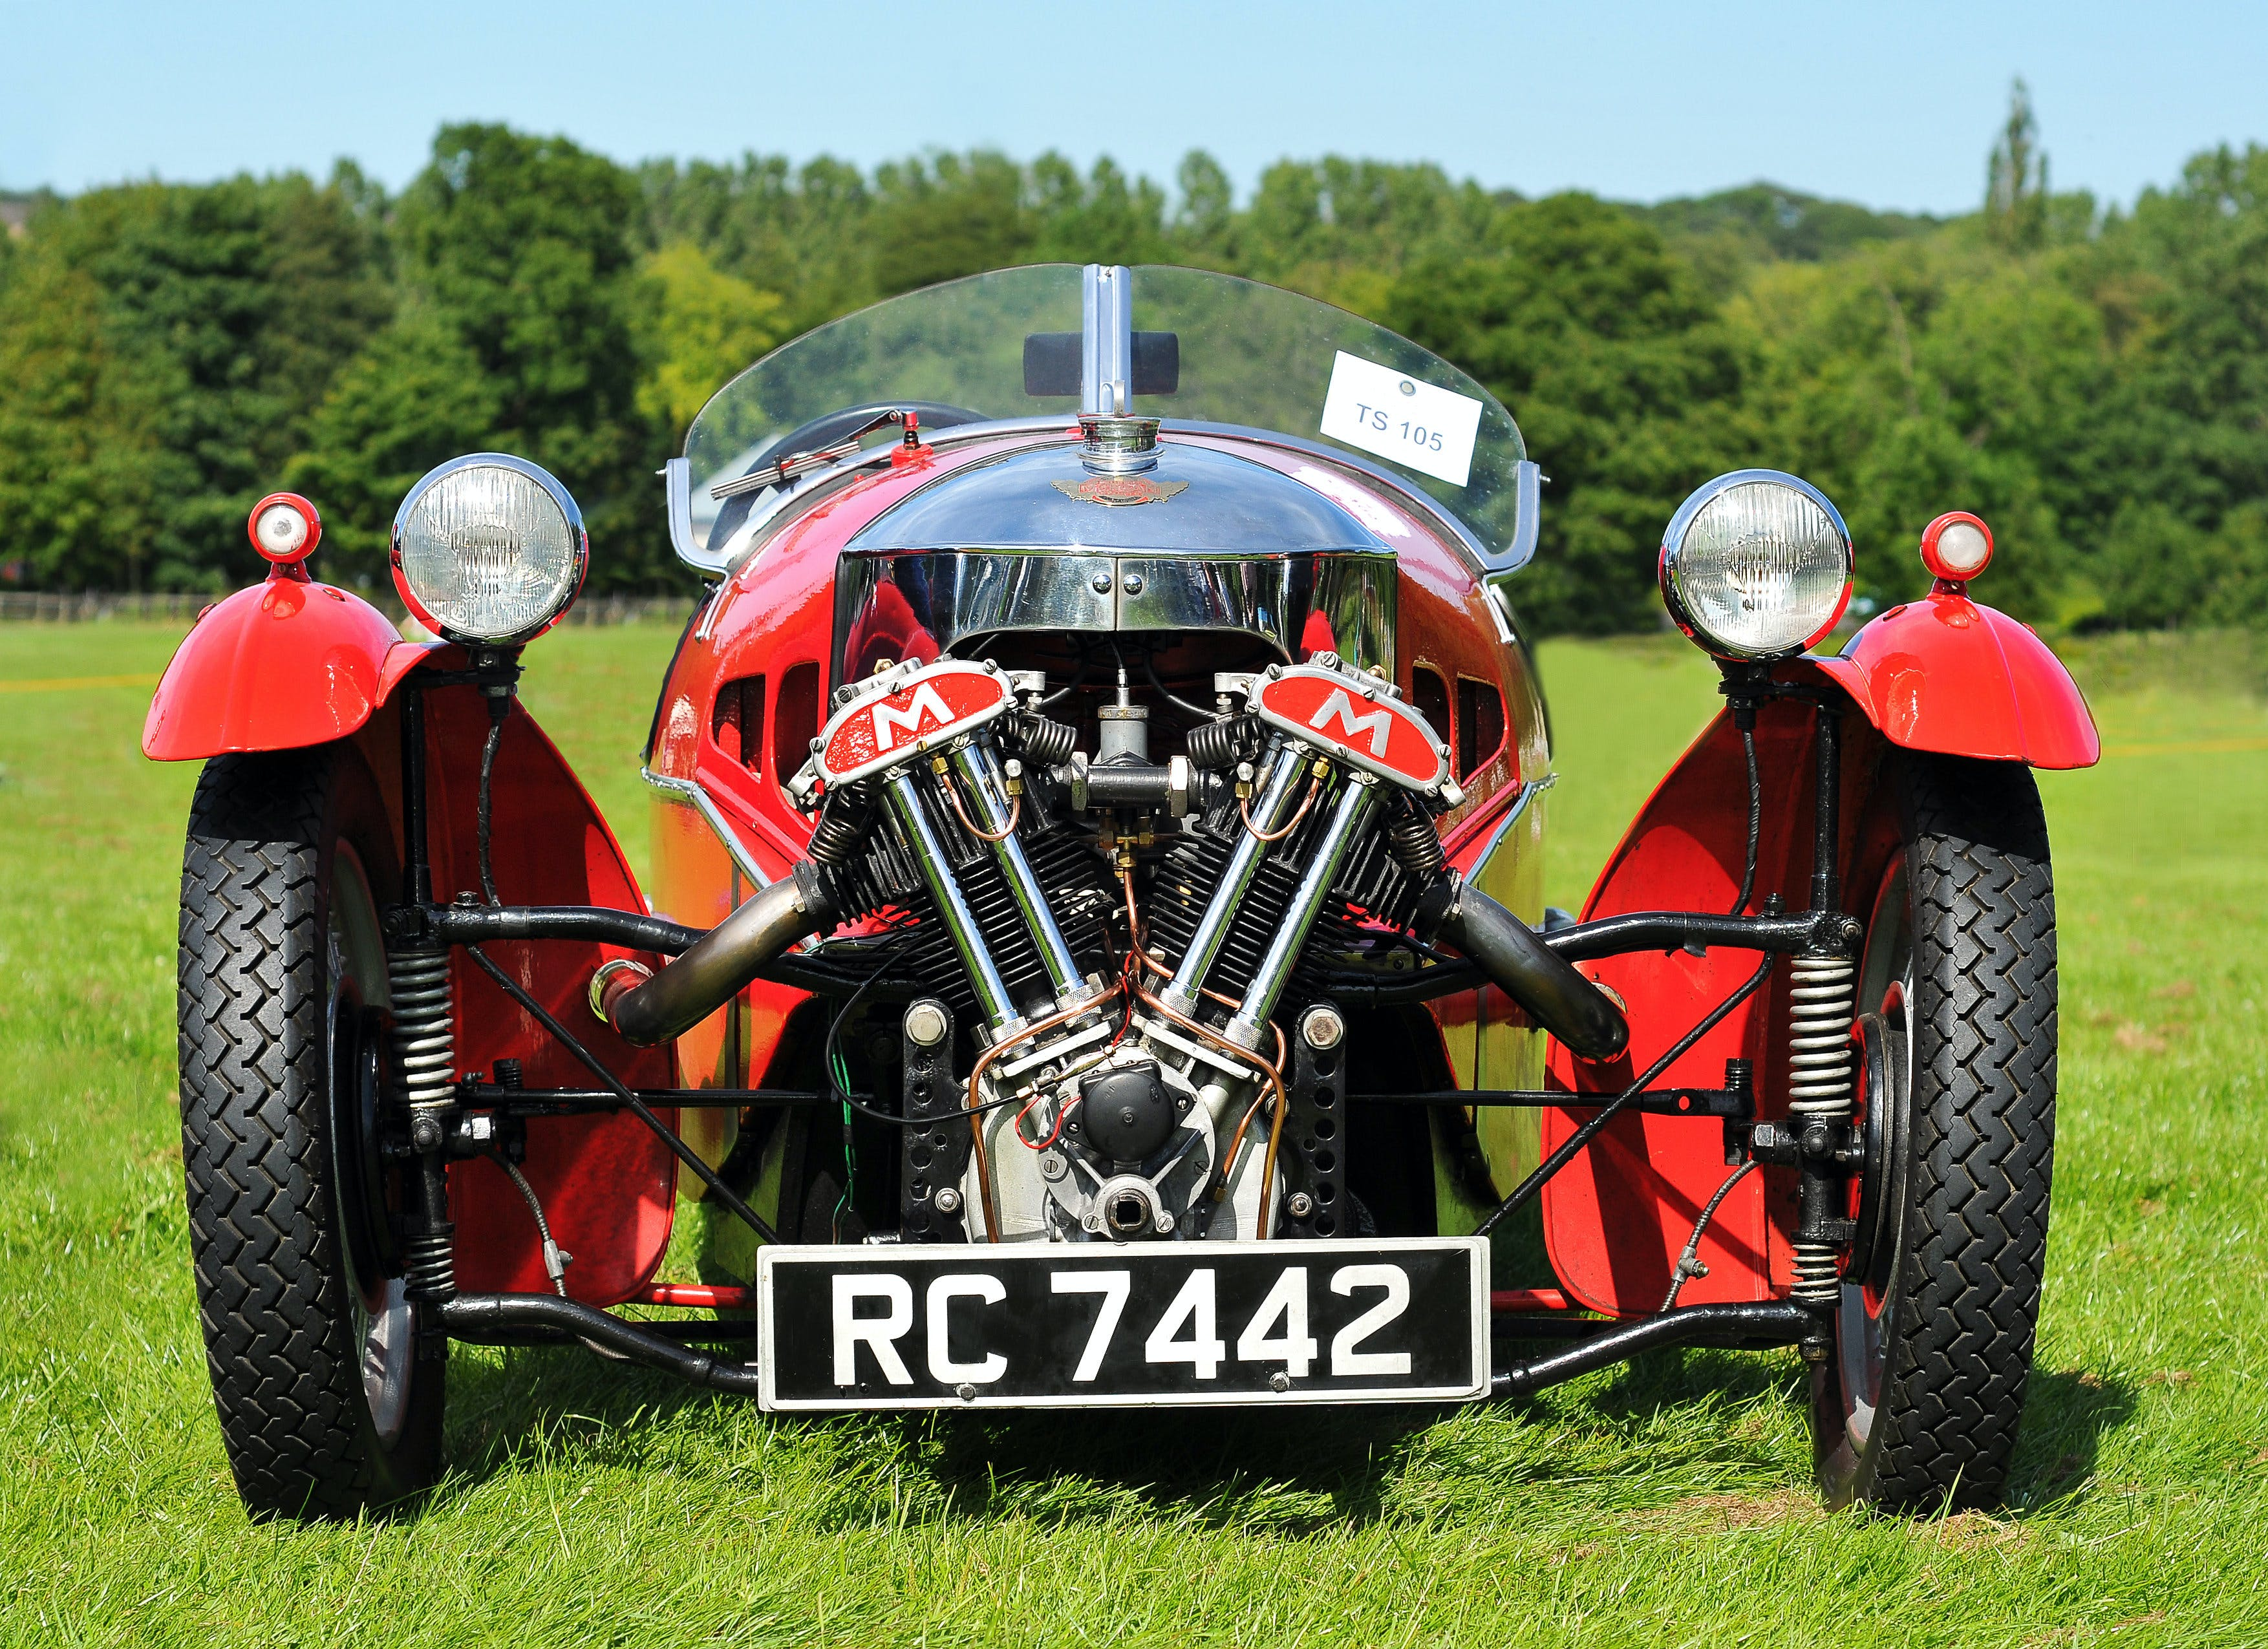 Free stock photo of 3-wheeler, car engine, classic car, Morgan